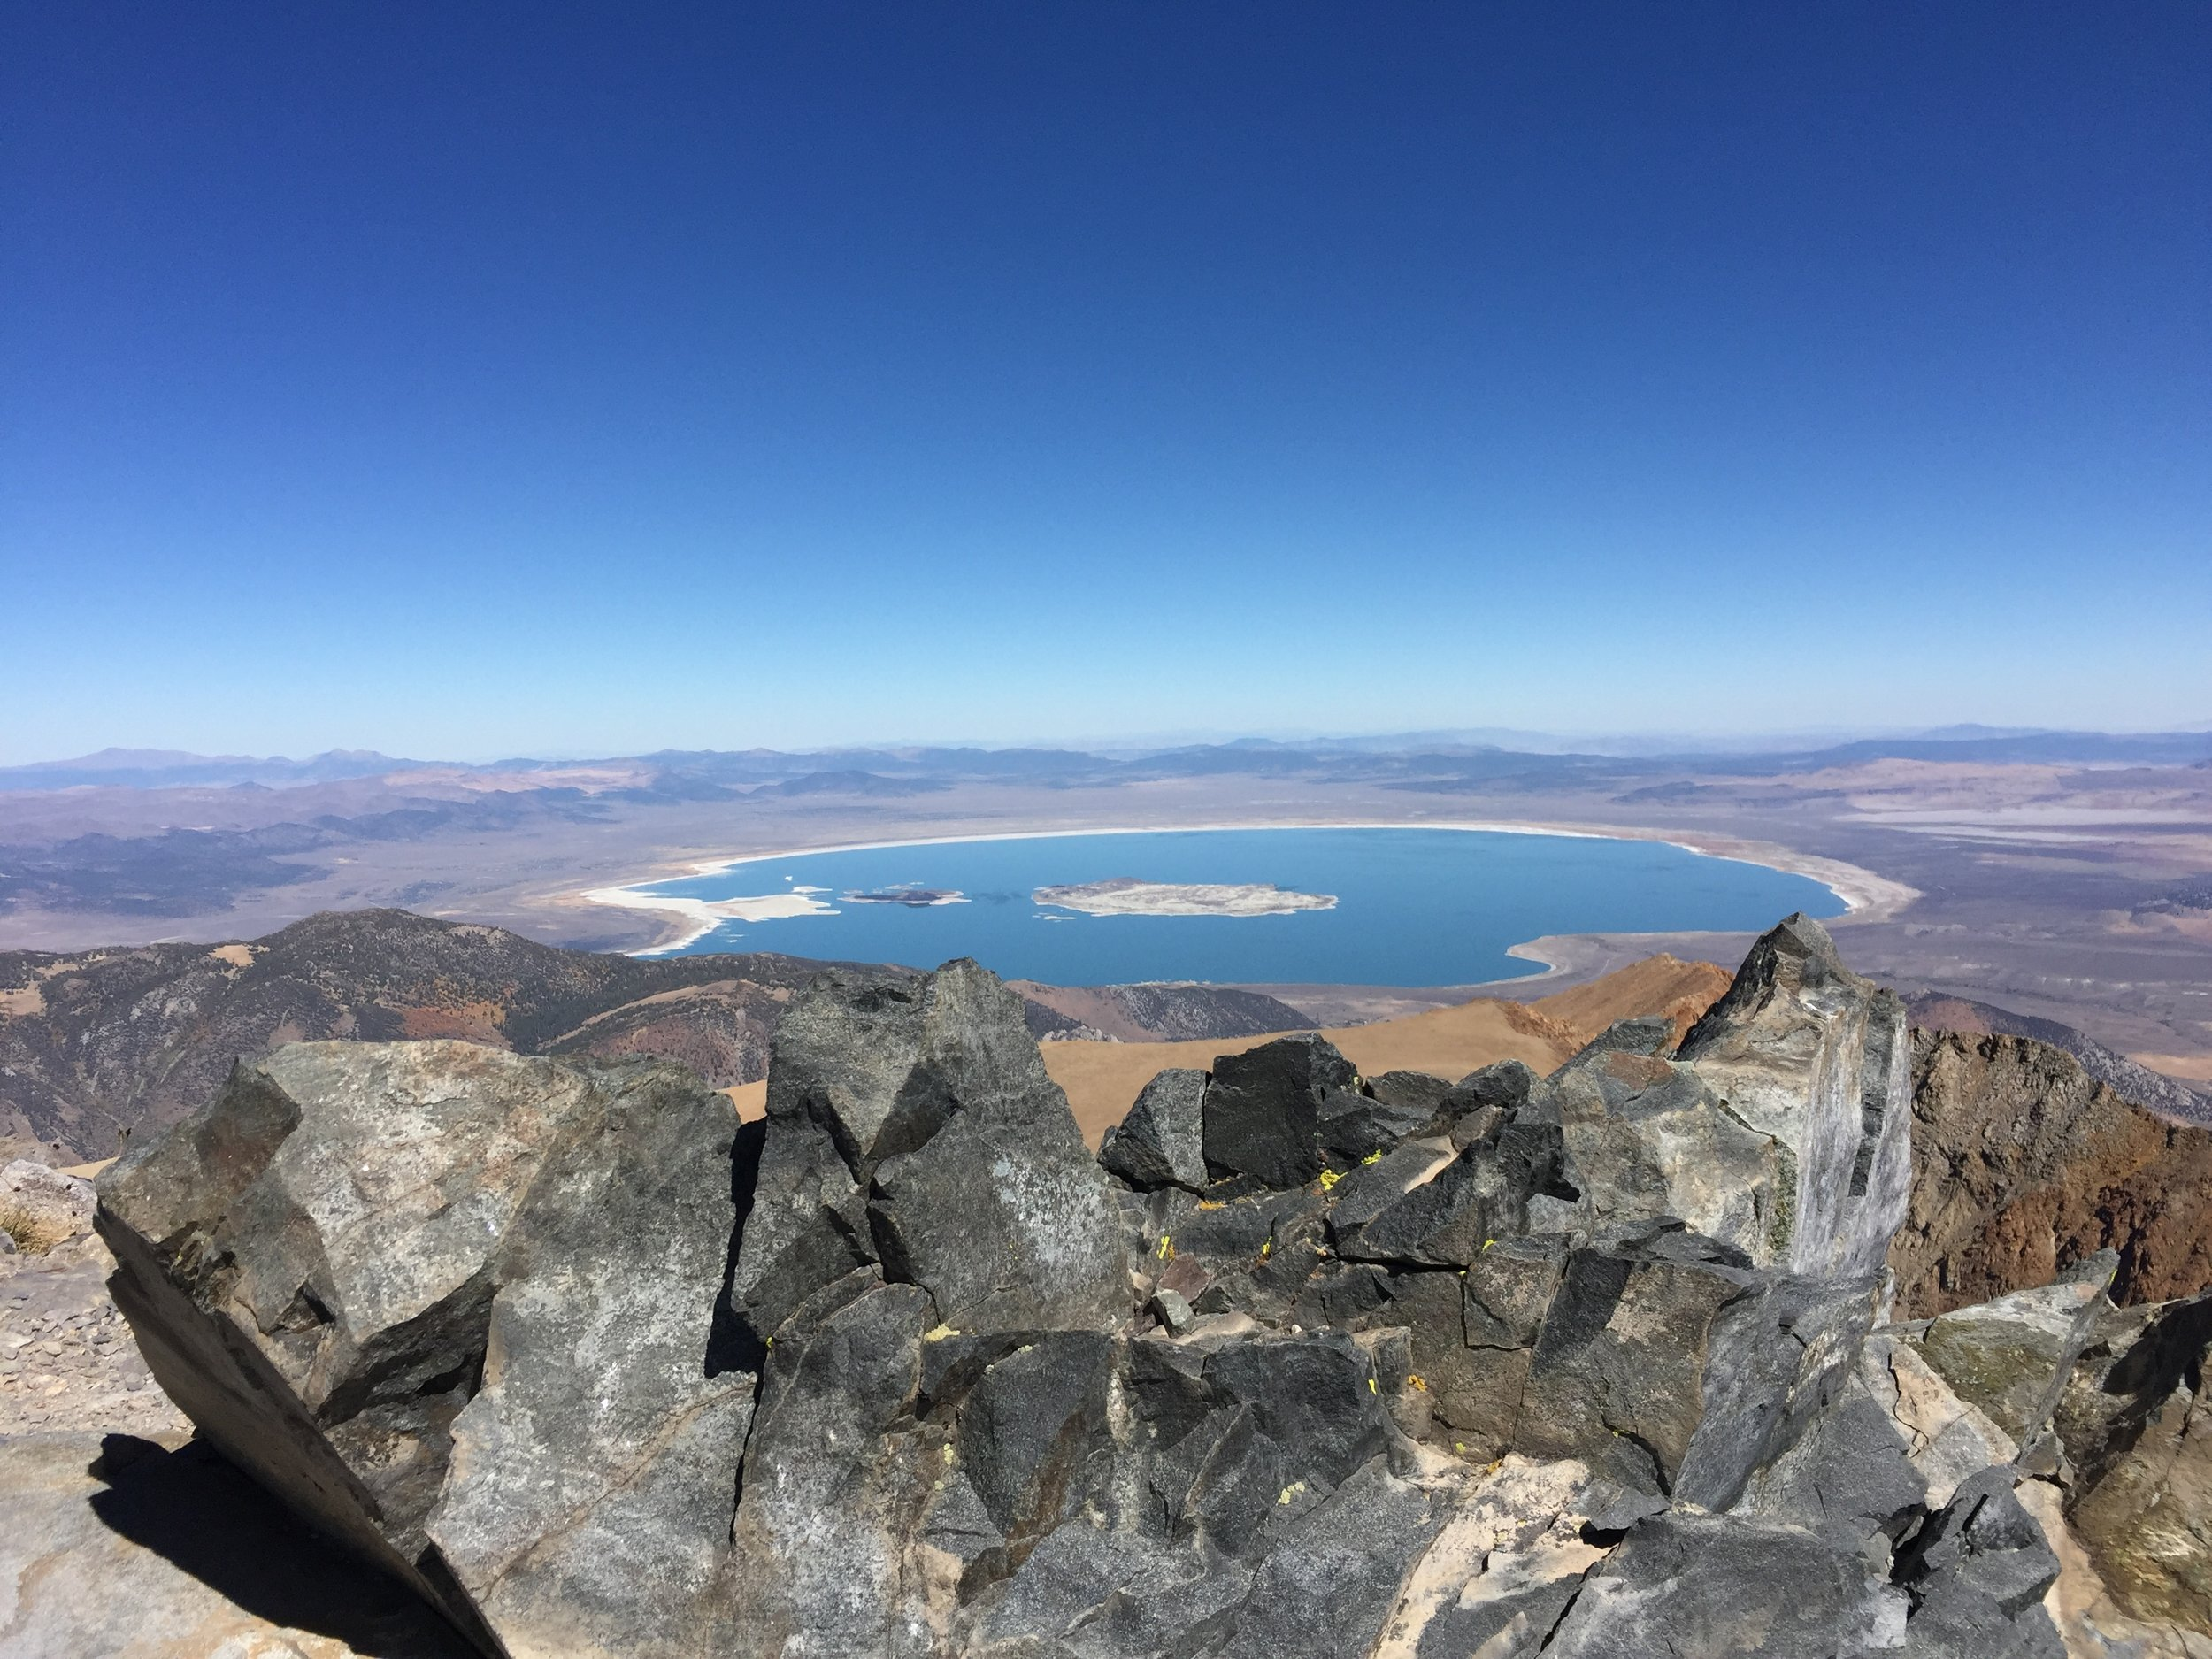 MONO LAKE FROM TOP OF MT. DANA